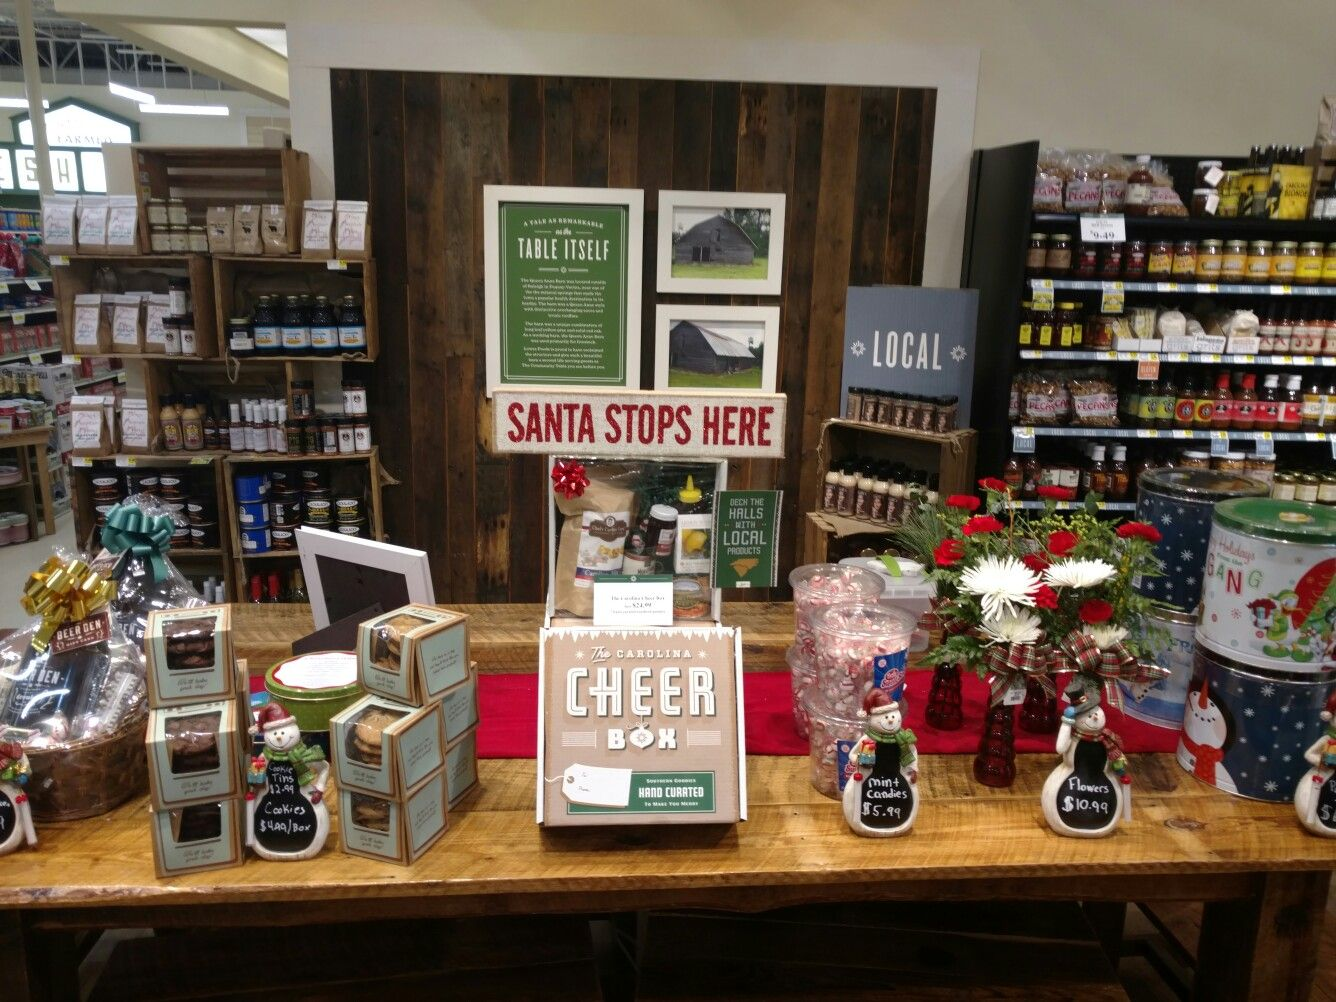 Last minute gift ideas! Popcorn tins, flowers, Carolina